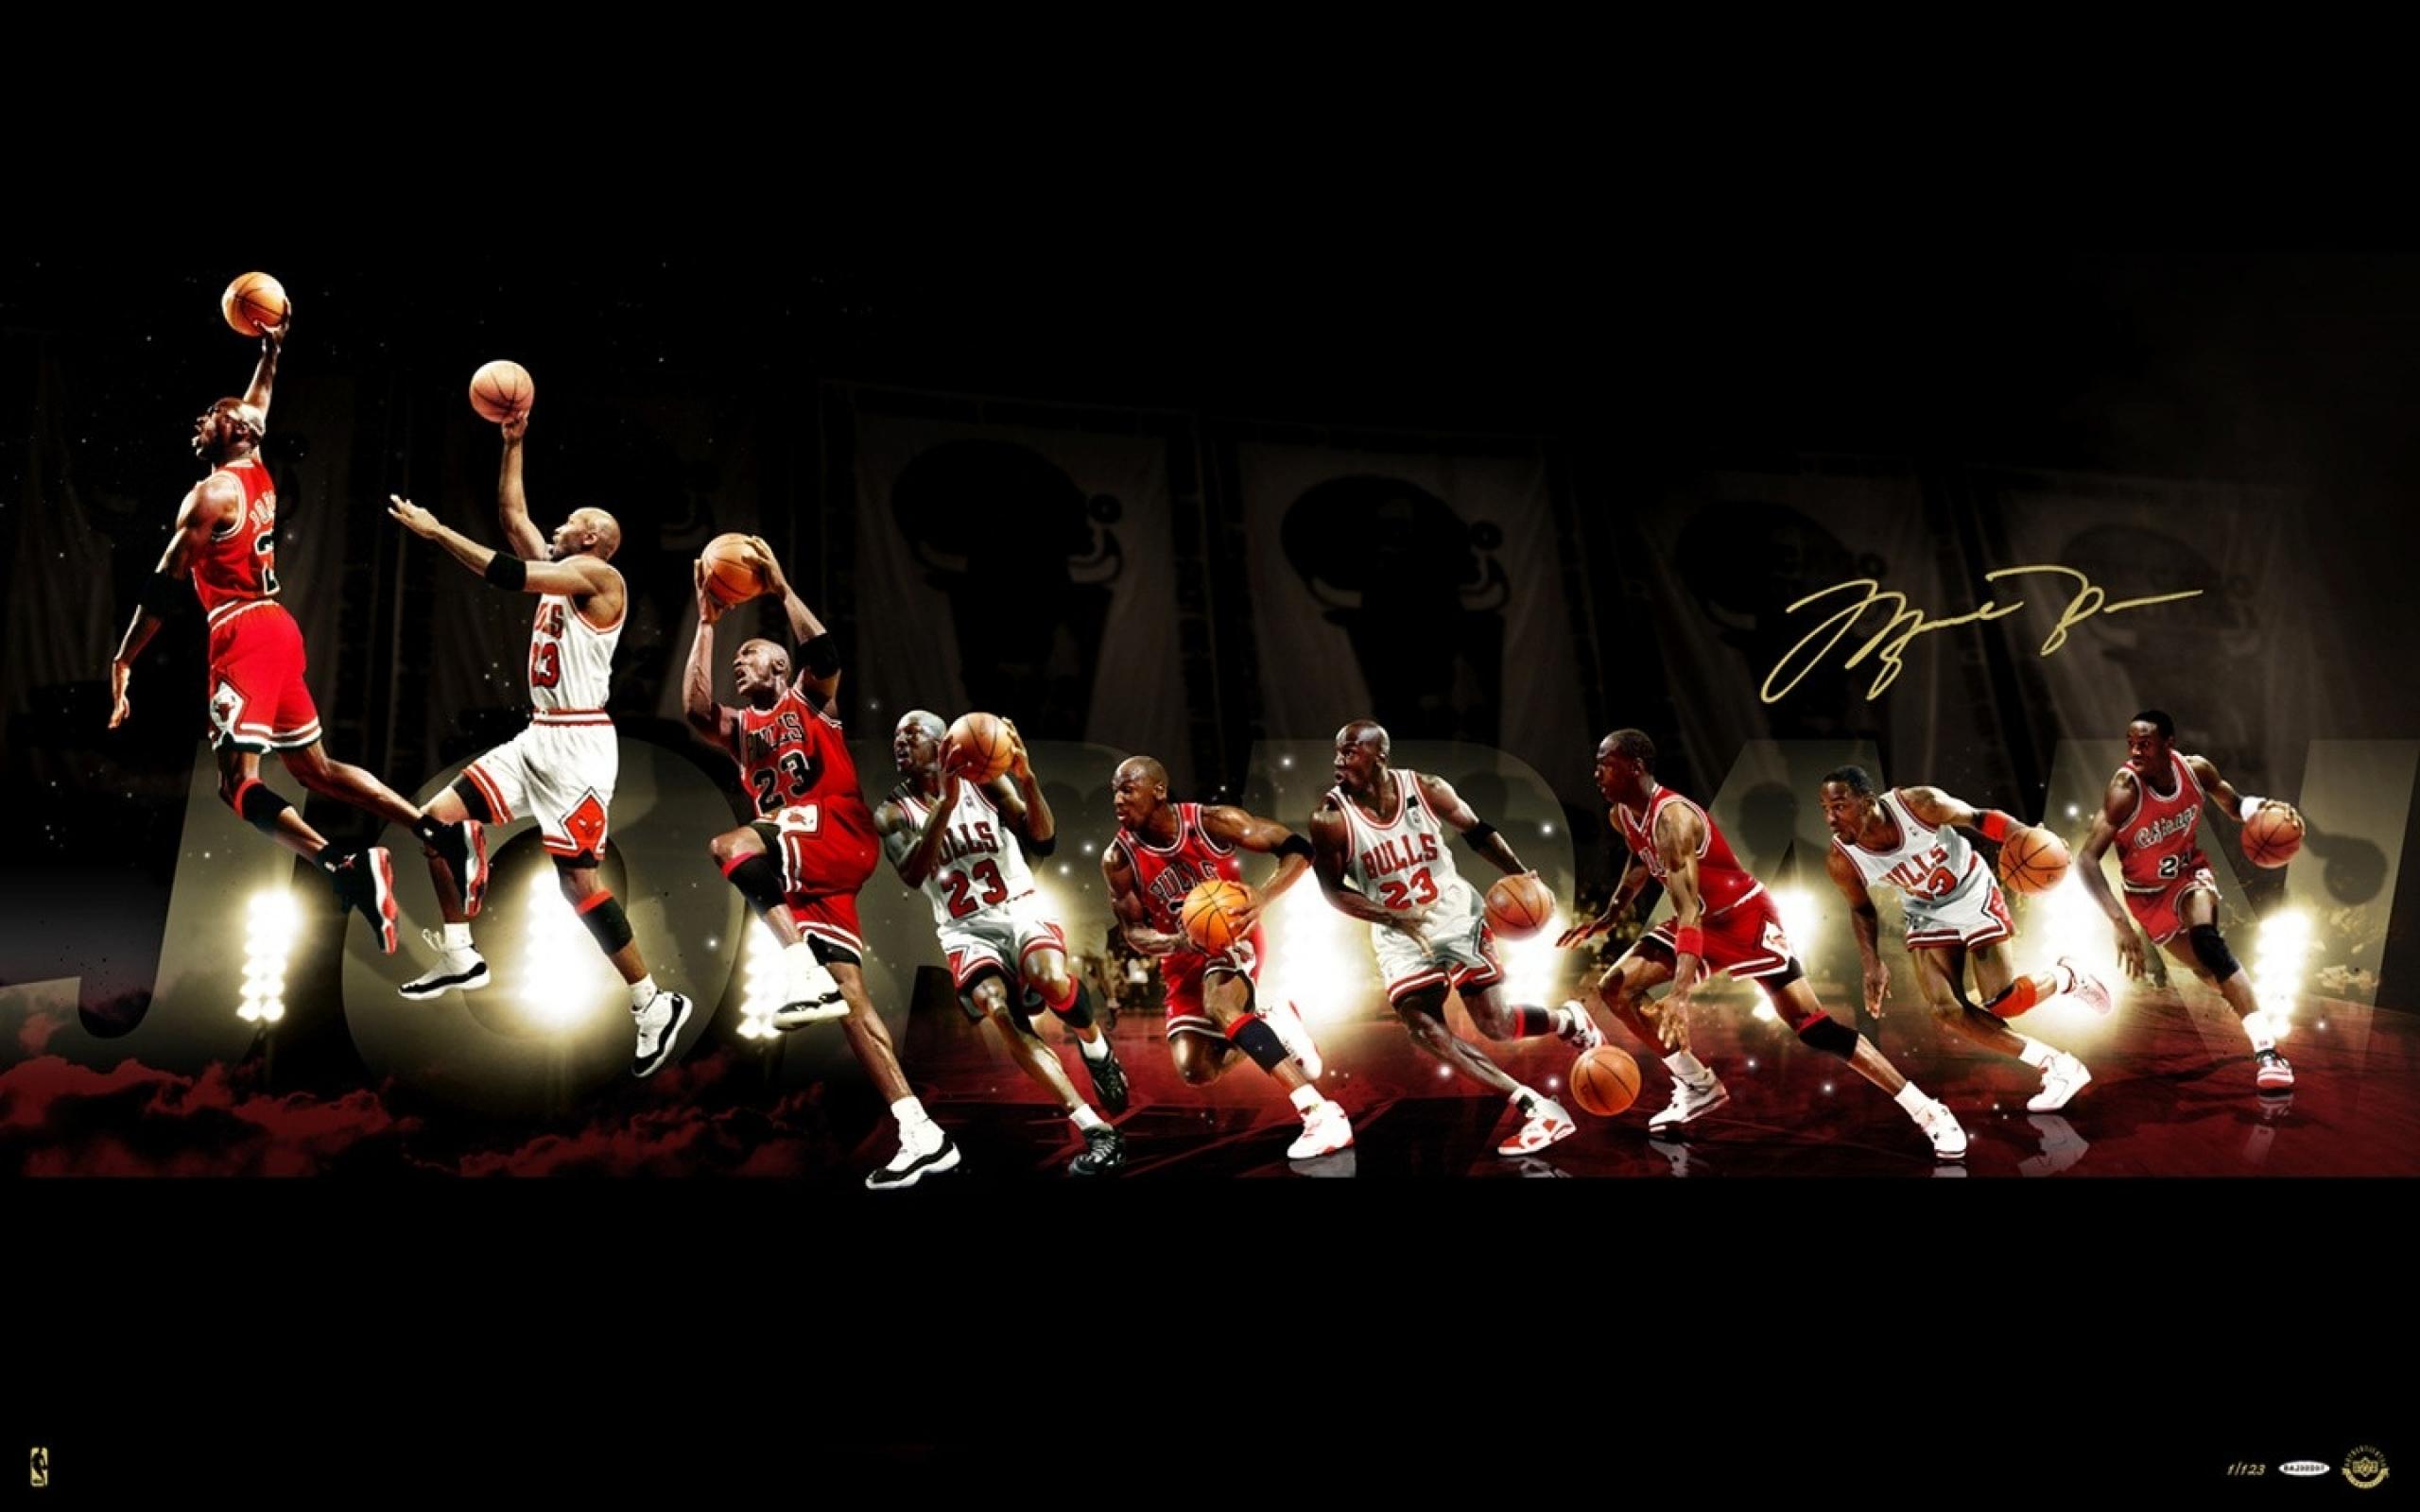 15 Michael Jordan HD Wallpapers | Backgrounds - Wallpaper Abyss